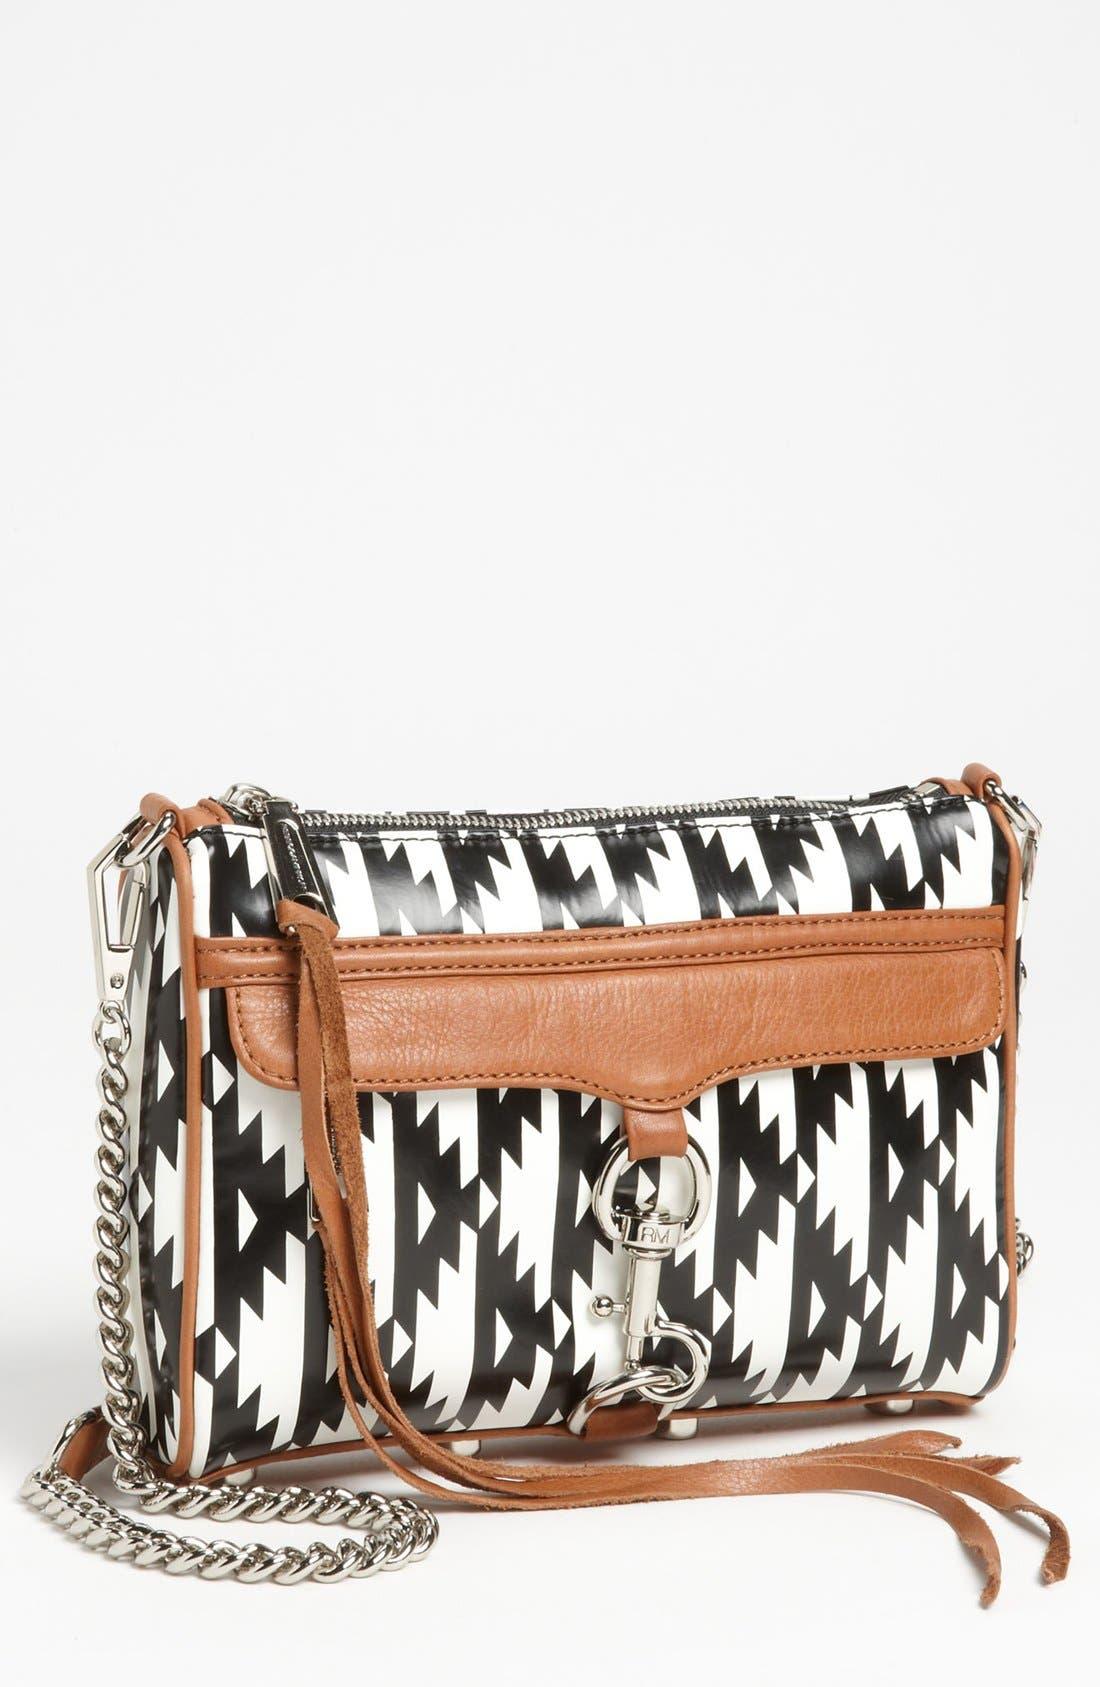 Main Image - Rebecca Minkoff 'Mini MAC' Ikat Leather Convertible Crossbody Bag